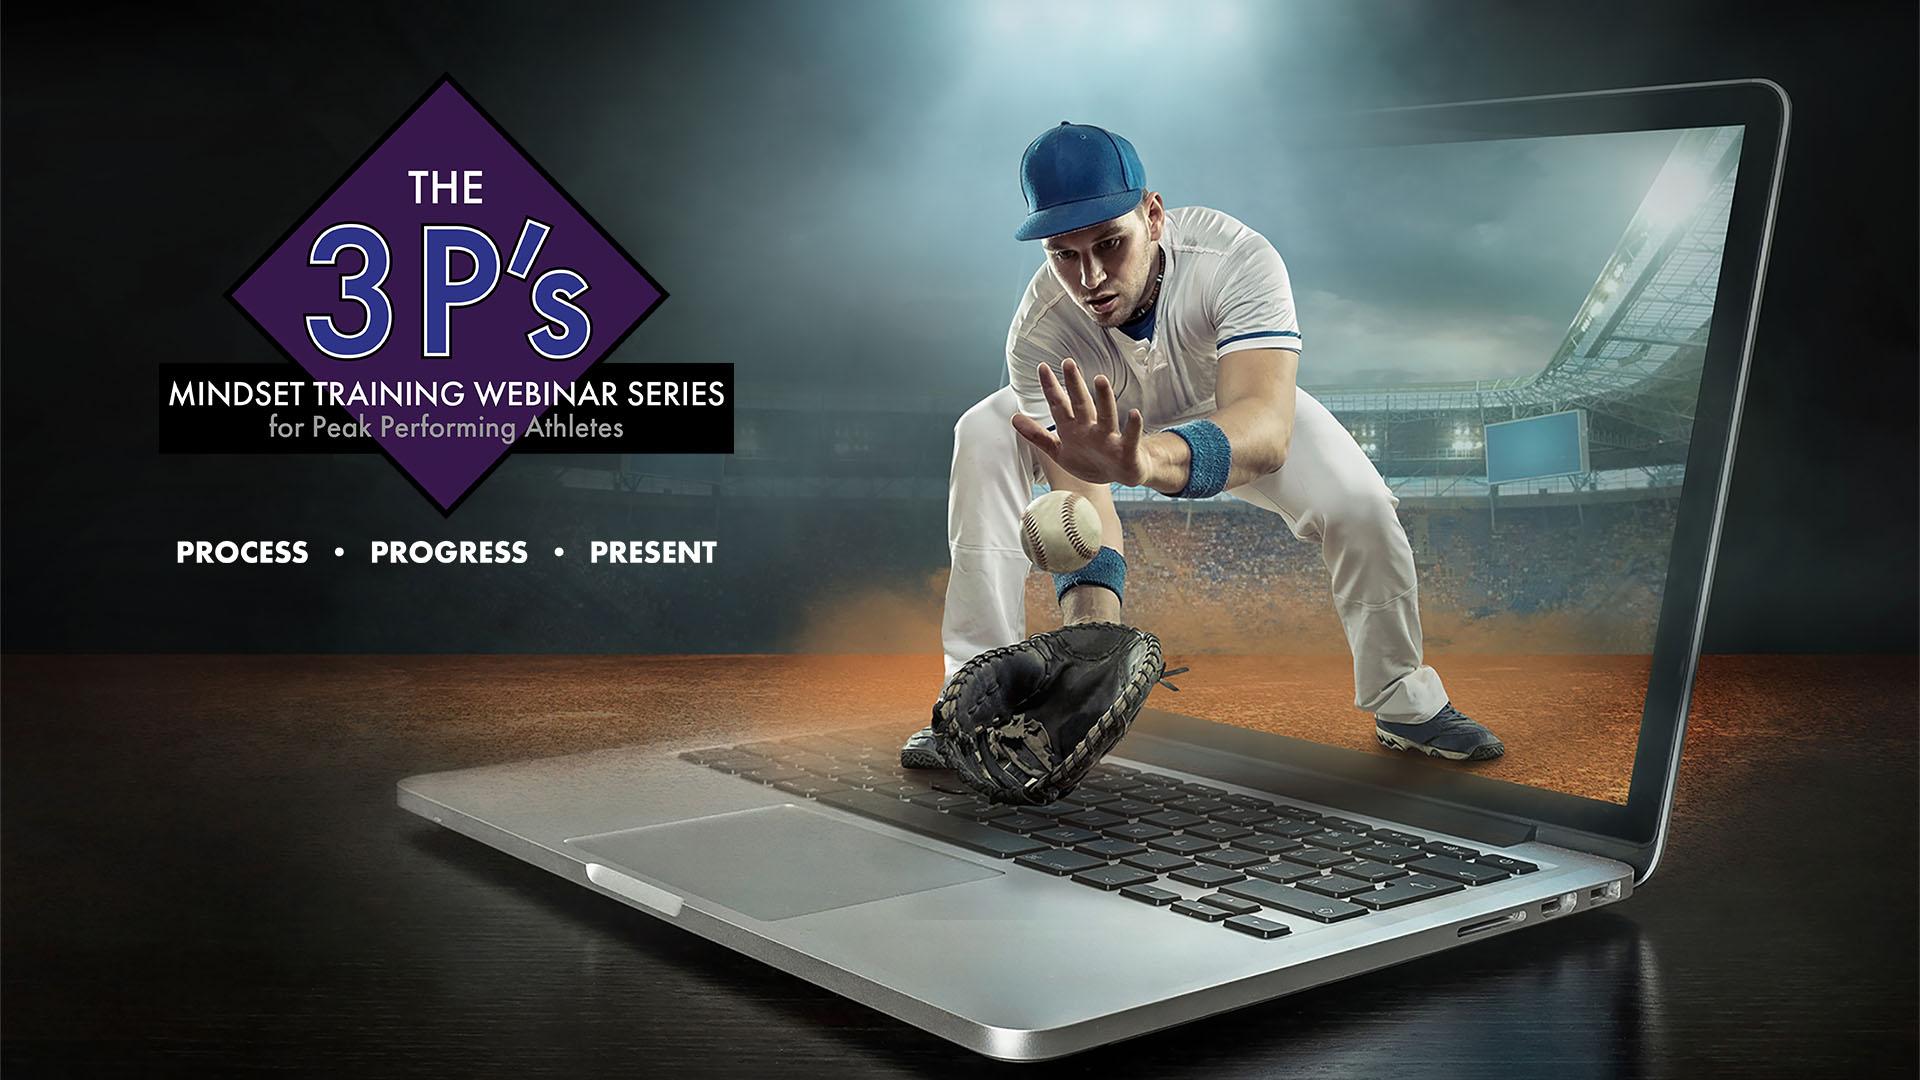 The 3 P's - Mindset Training Webinar Series